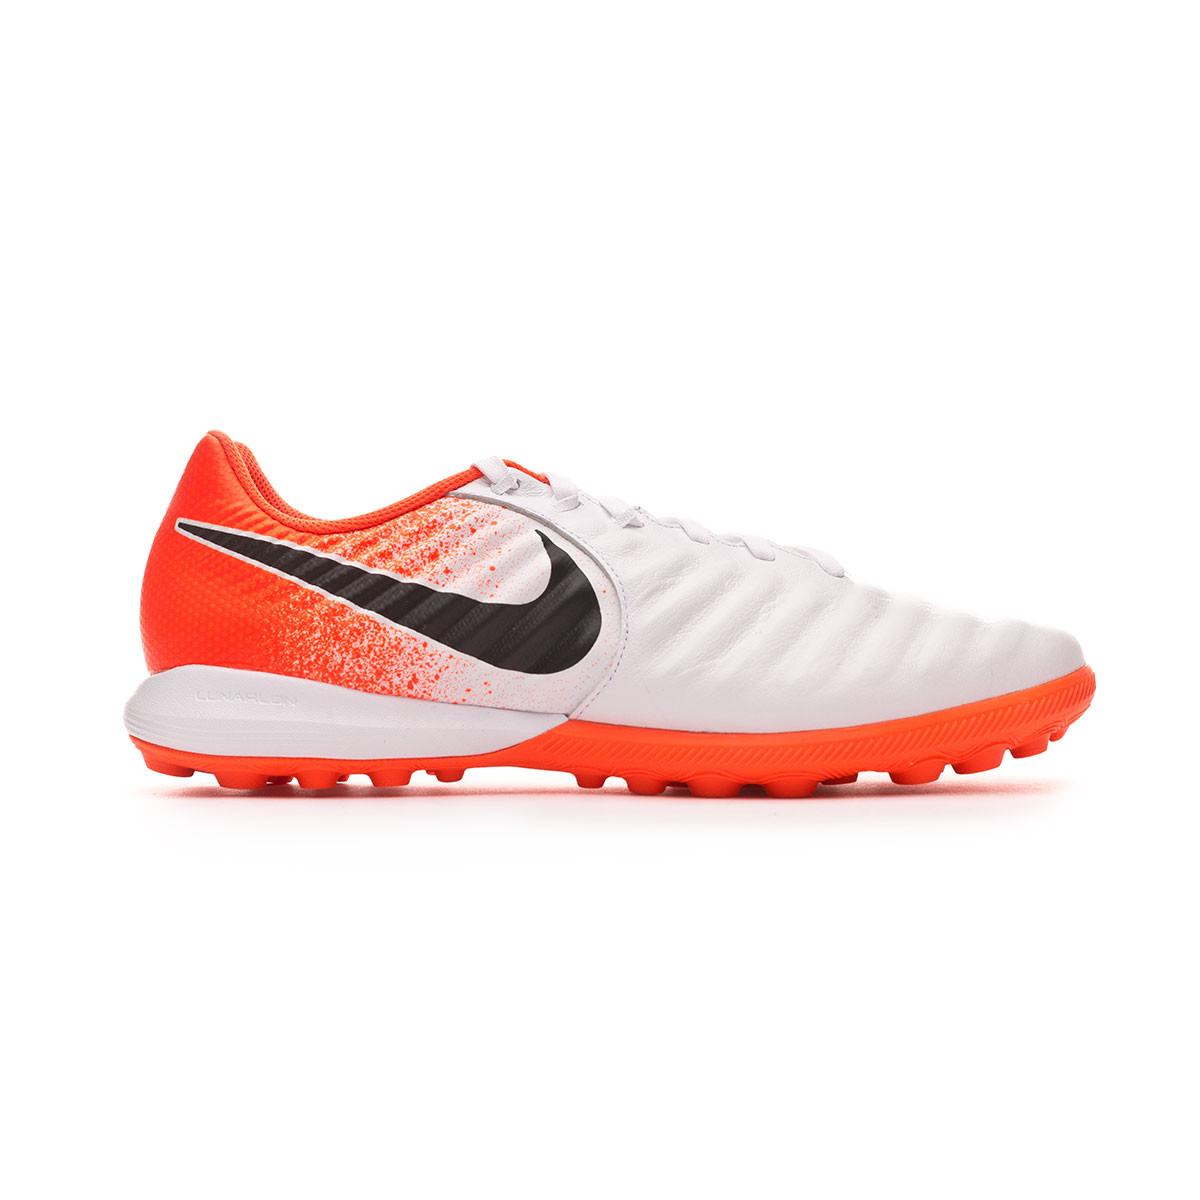 c74770d97b3 Football Boot Nike Lunar LegendX 7 Pro Turf White-Black-Hyper crimson -  Football store Fútbol Emotion